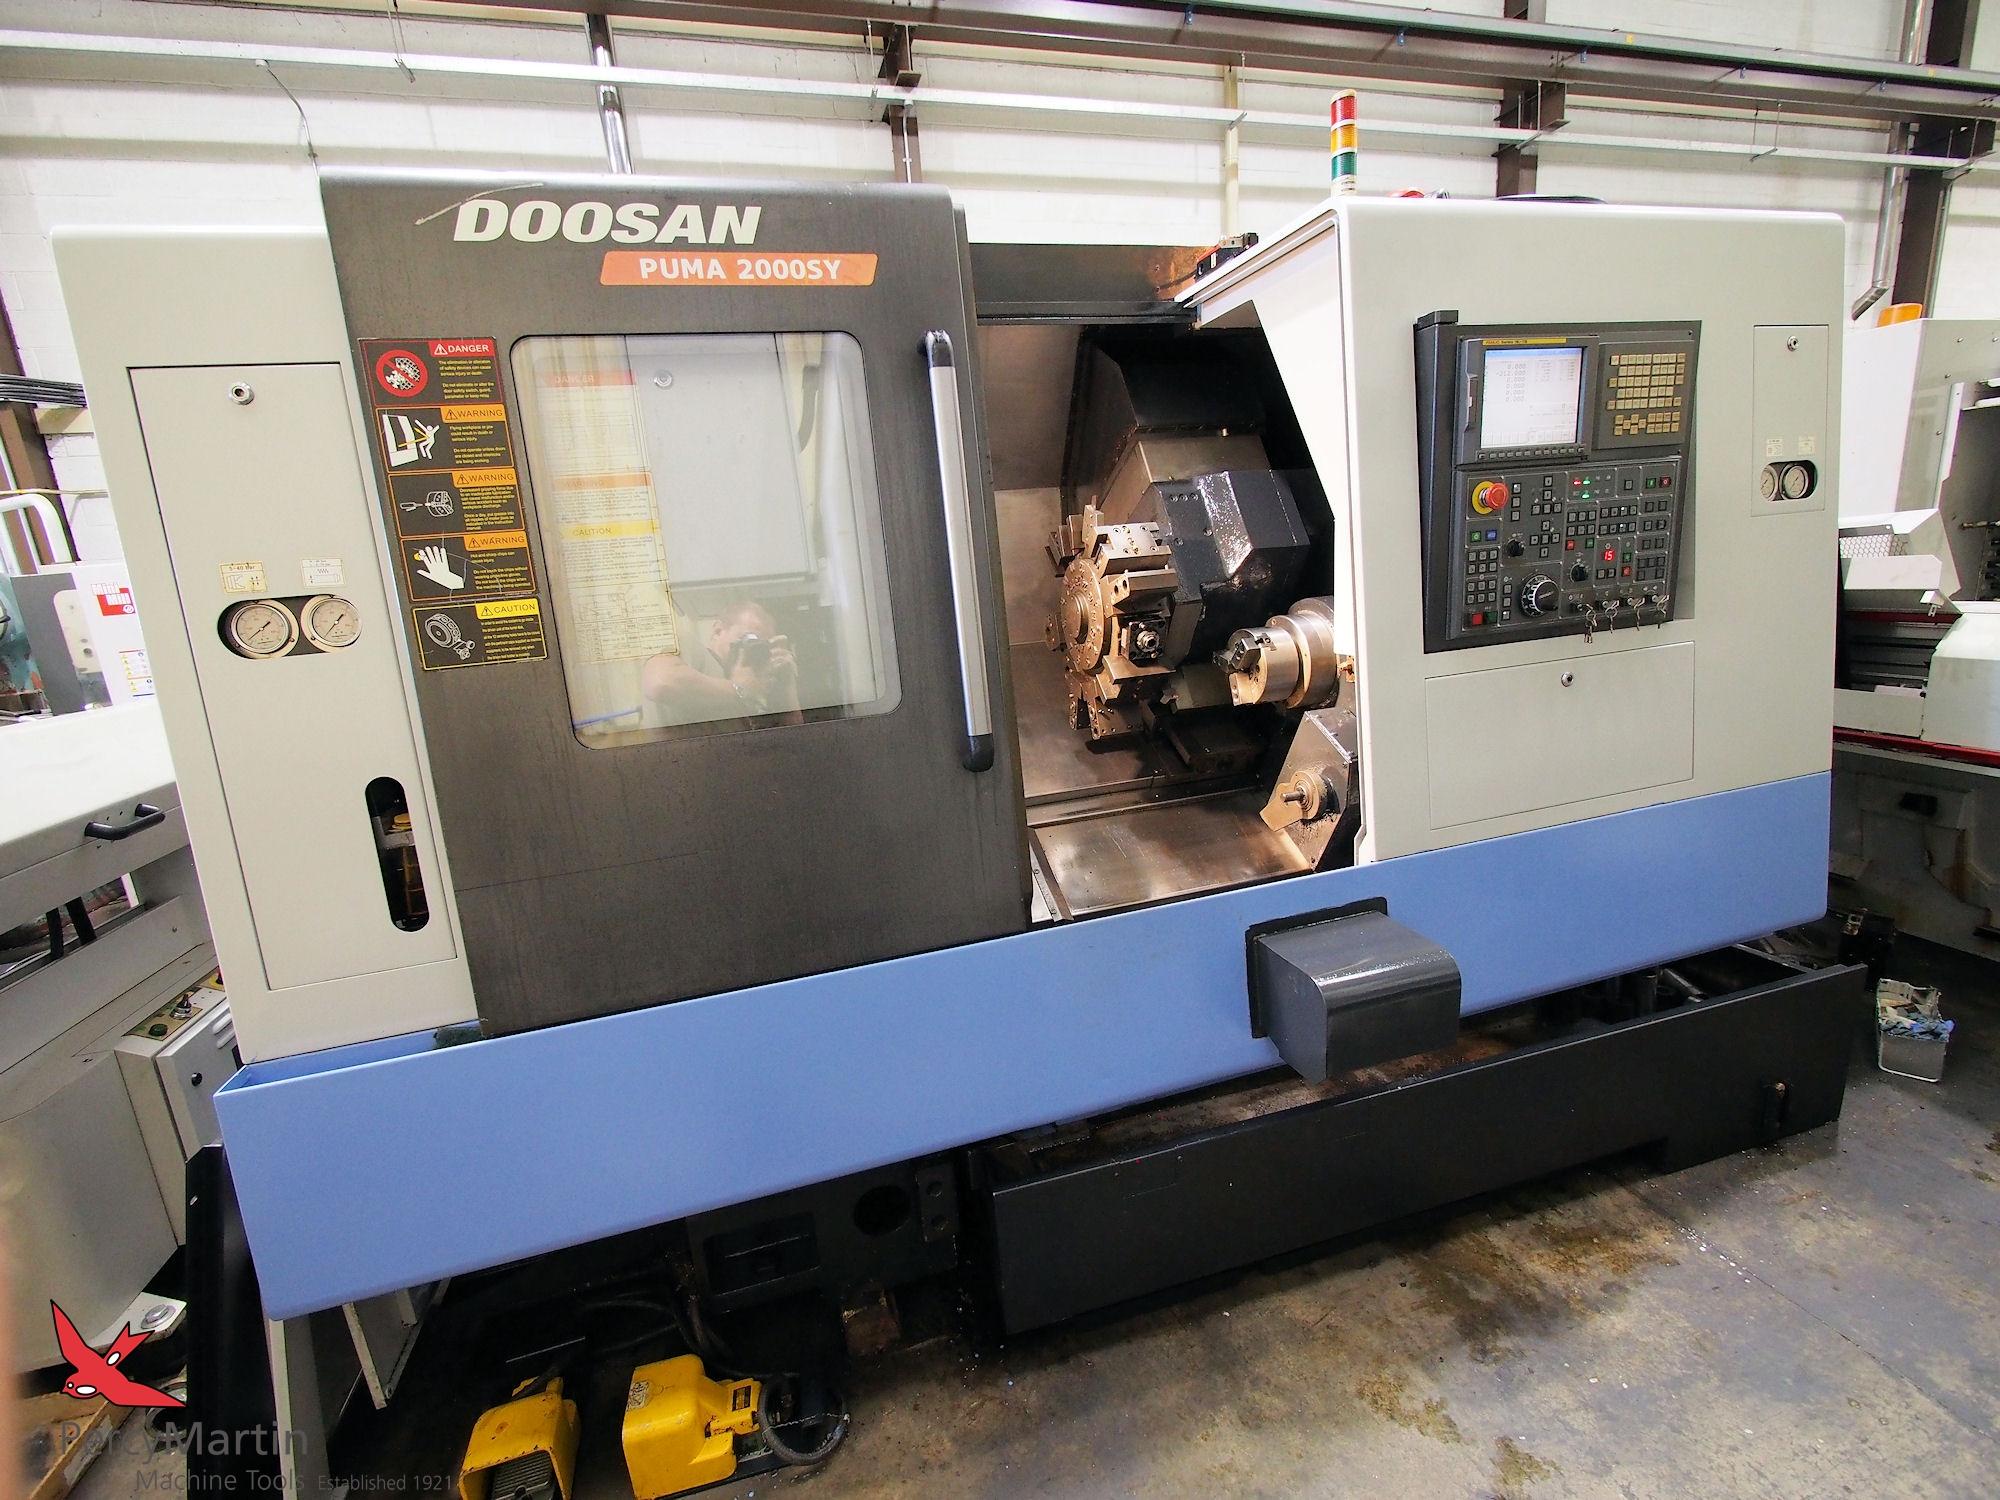 used doosan puma 2000sy 2007 cnc lathes with milling for sale rh percymartin co uk CNC Lathe Machine CNC Lathe Machine